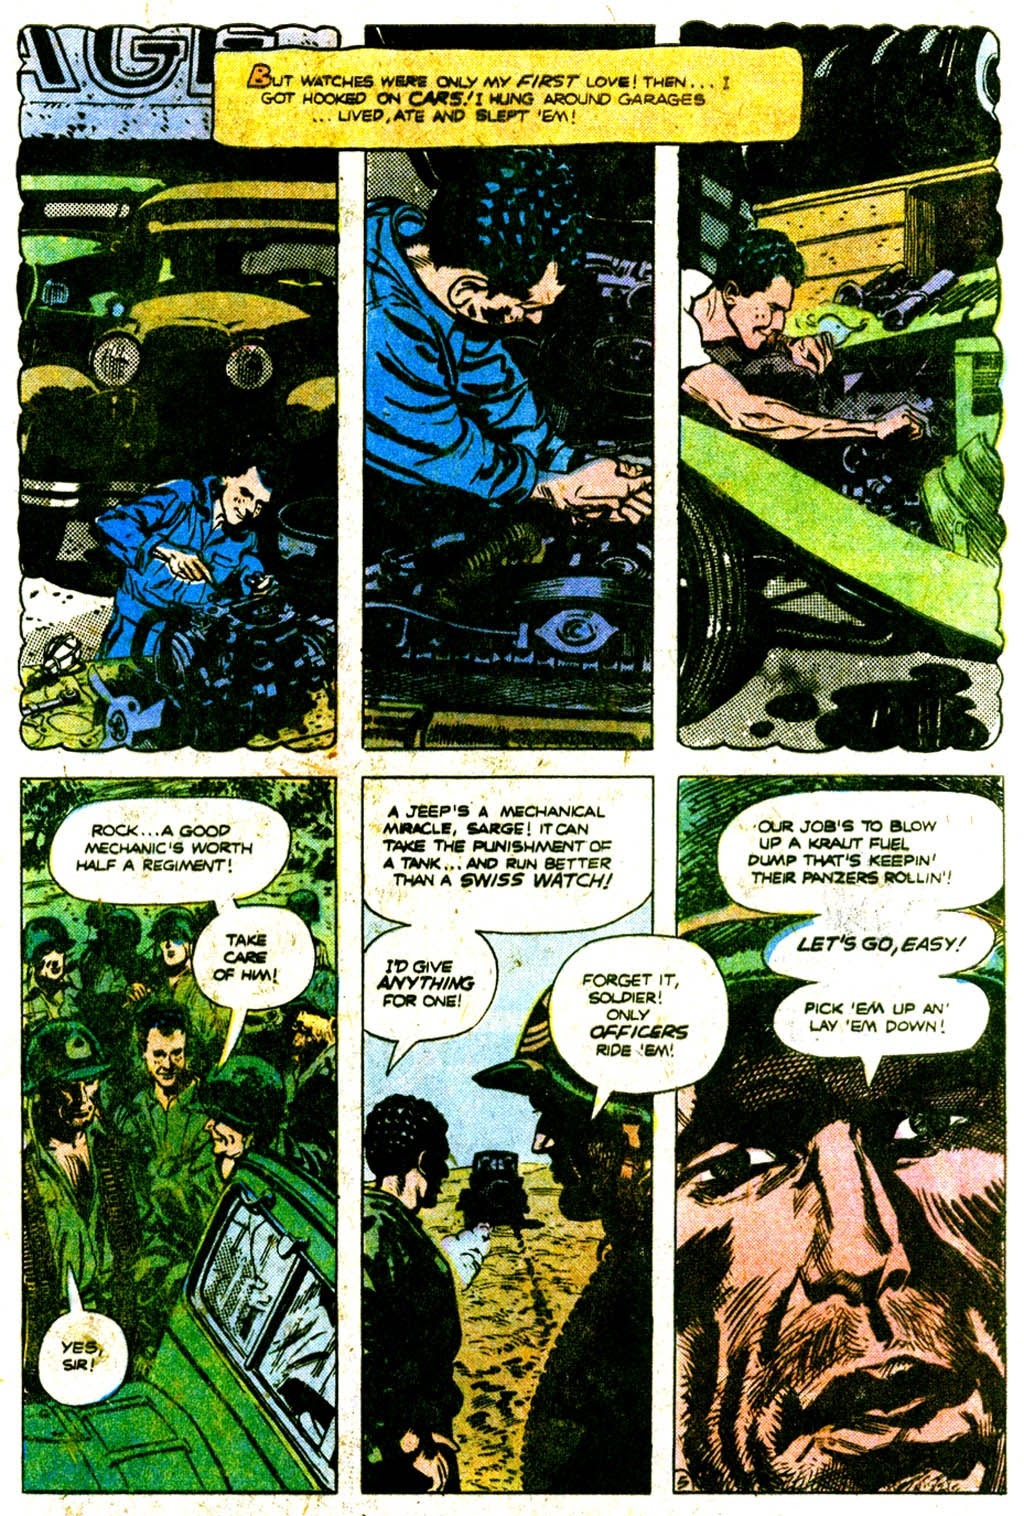 Read online Sgt. Rock comic -  Issue #313 - 8